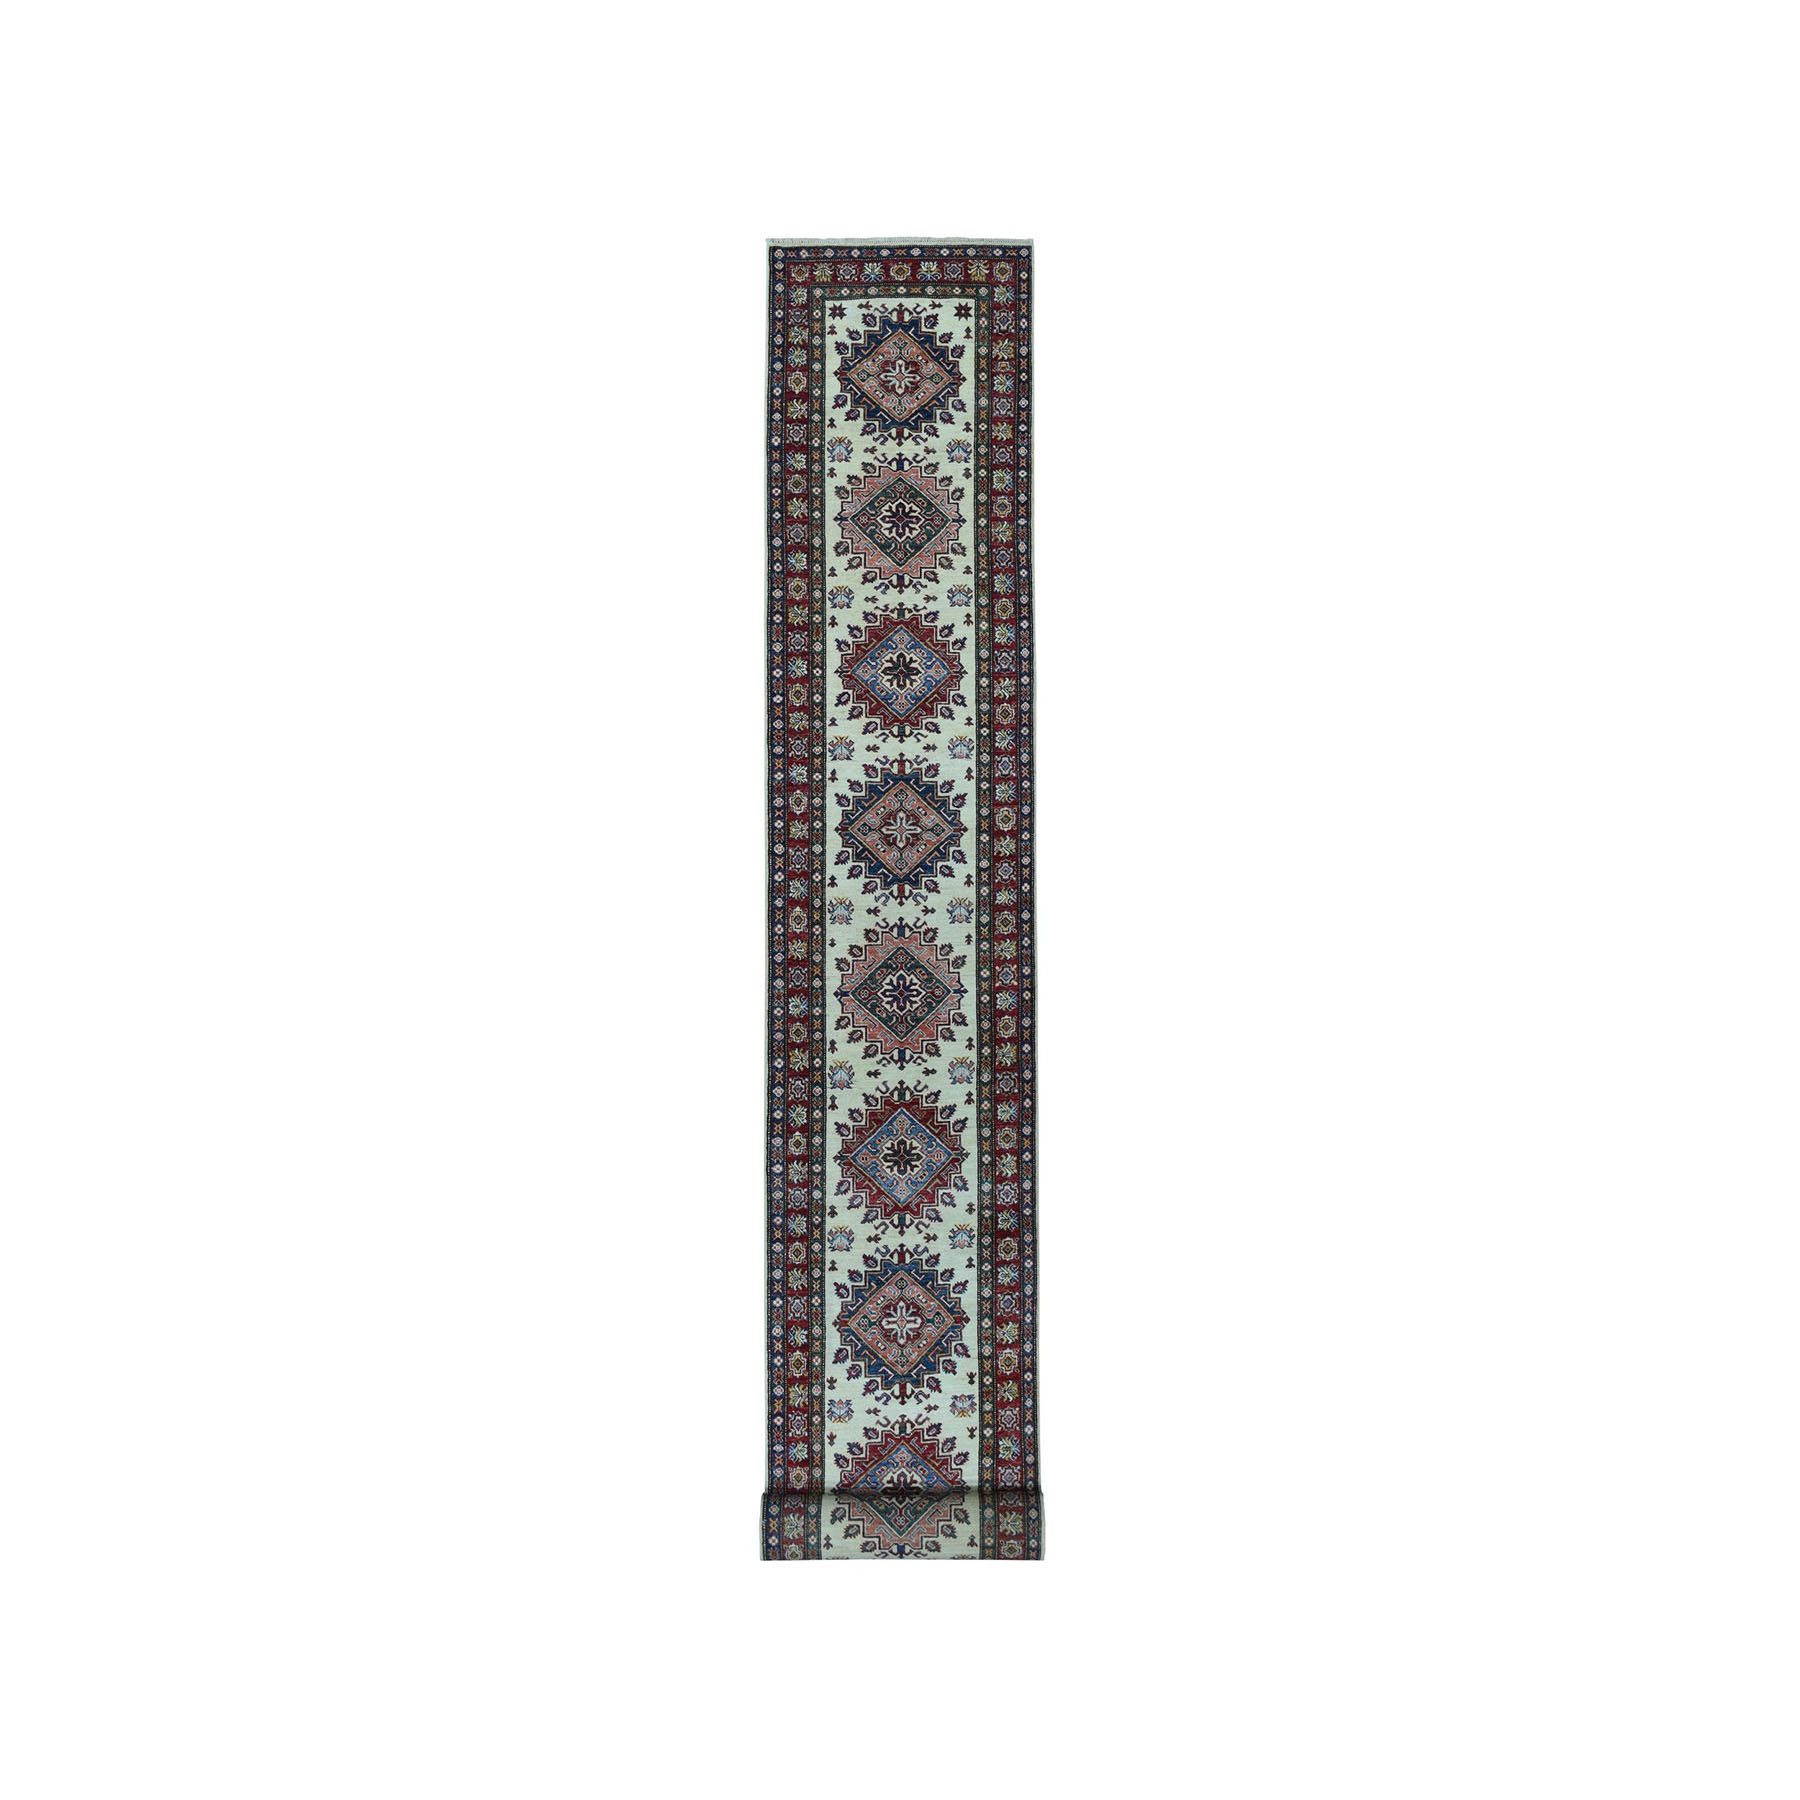 "2'9""X19' Ivory Super Kazak Geometric Design Xl Runner Pure Wool Hand-Knotted Oriental Rug moae06d6"